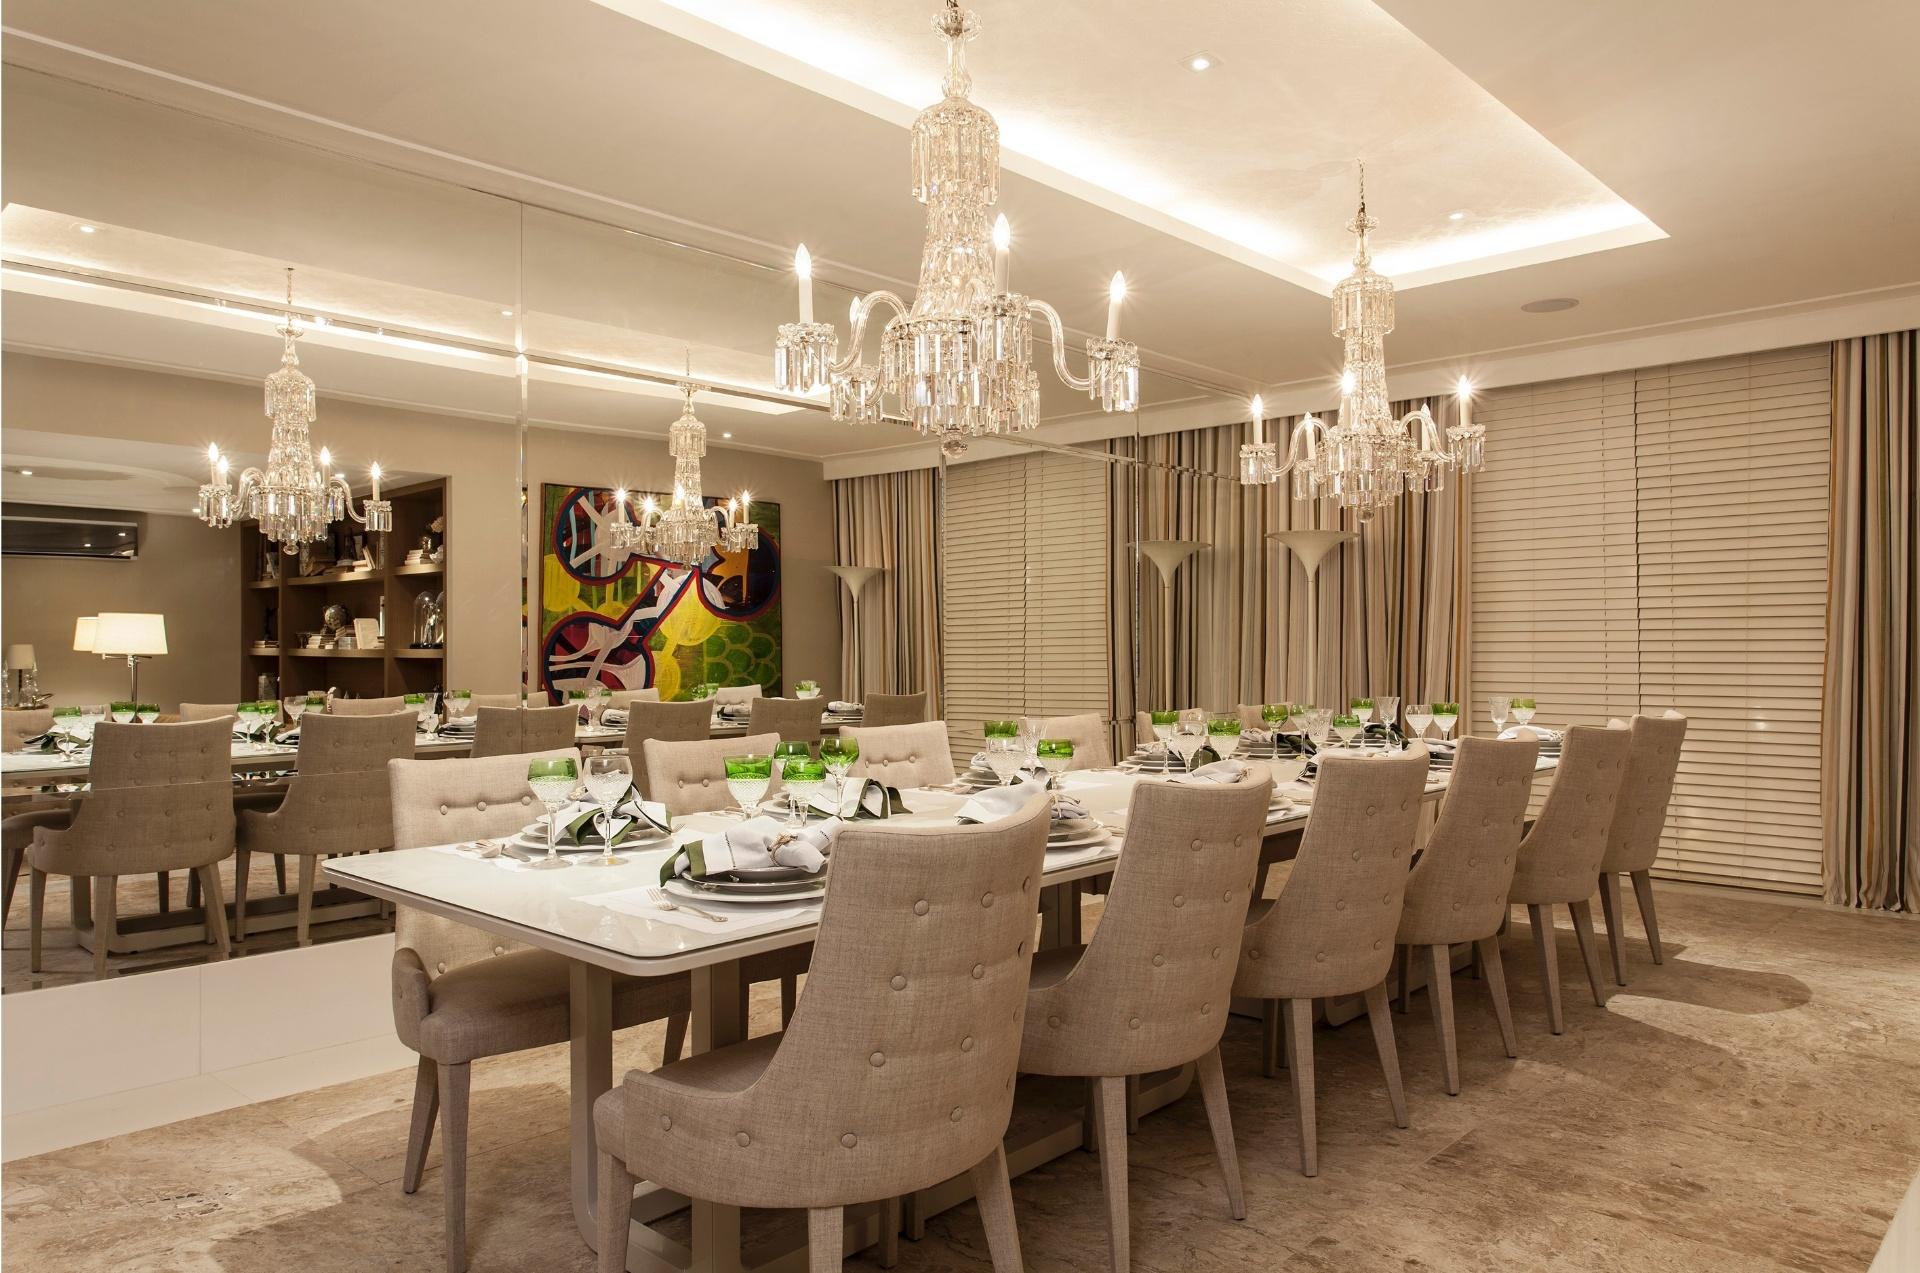 Na sala de jantar localizada no terceiro piso da Casa Bola de  #B38918 1920 1273